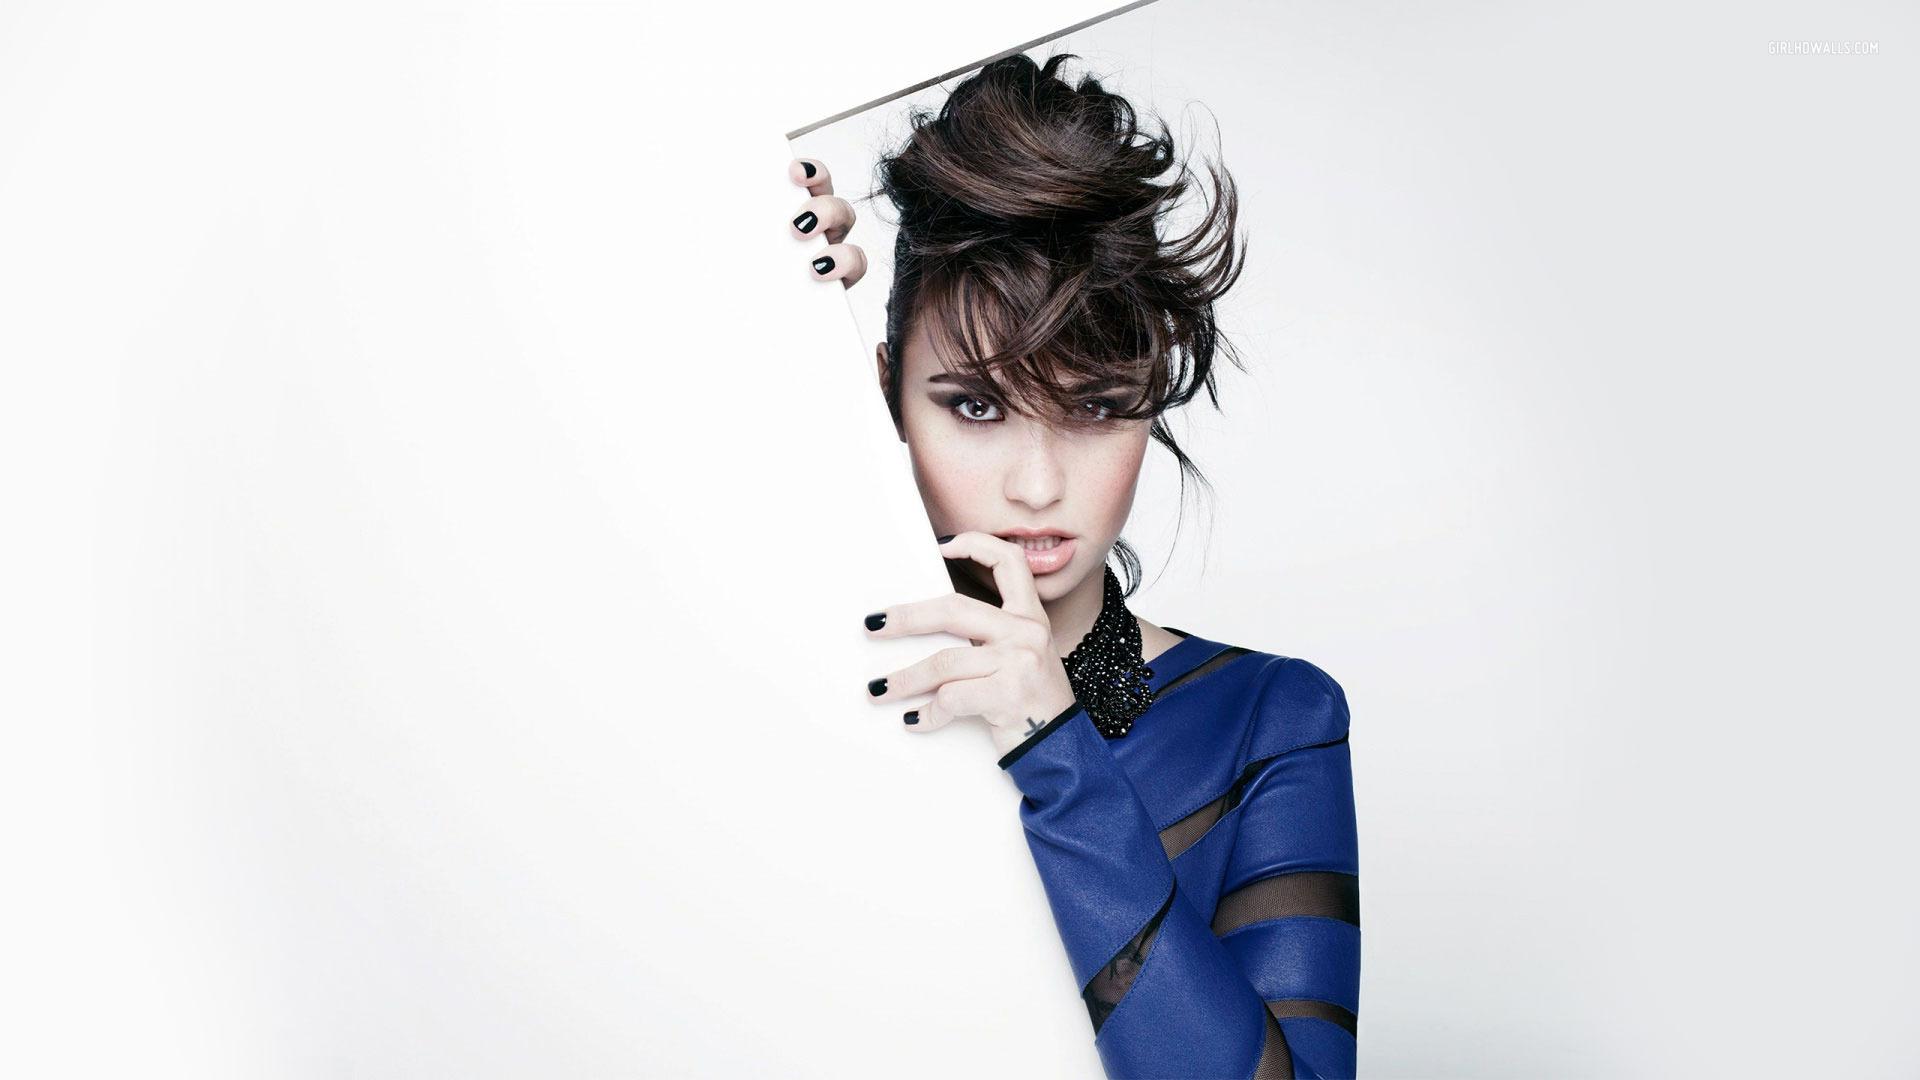 Demi Lovato Desktop Backgrounds   Wallpaper High Definition High 1920x1080